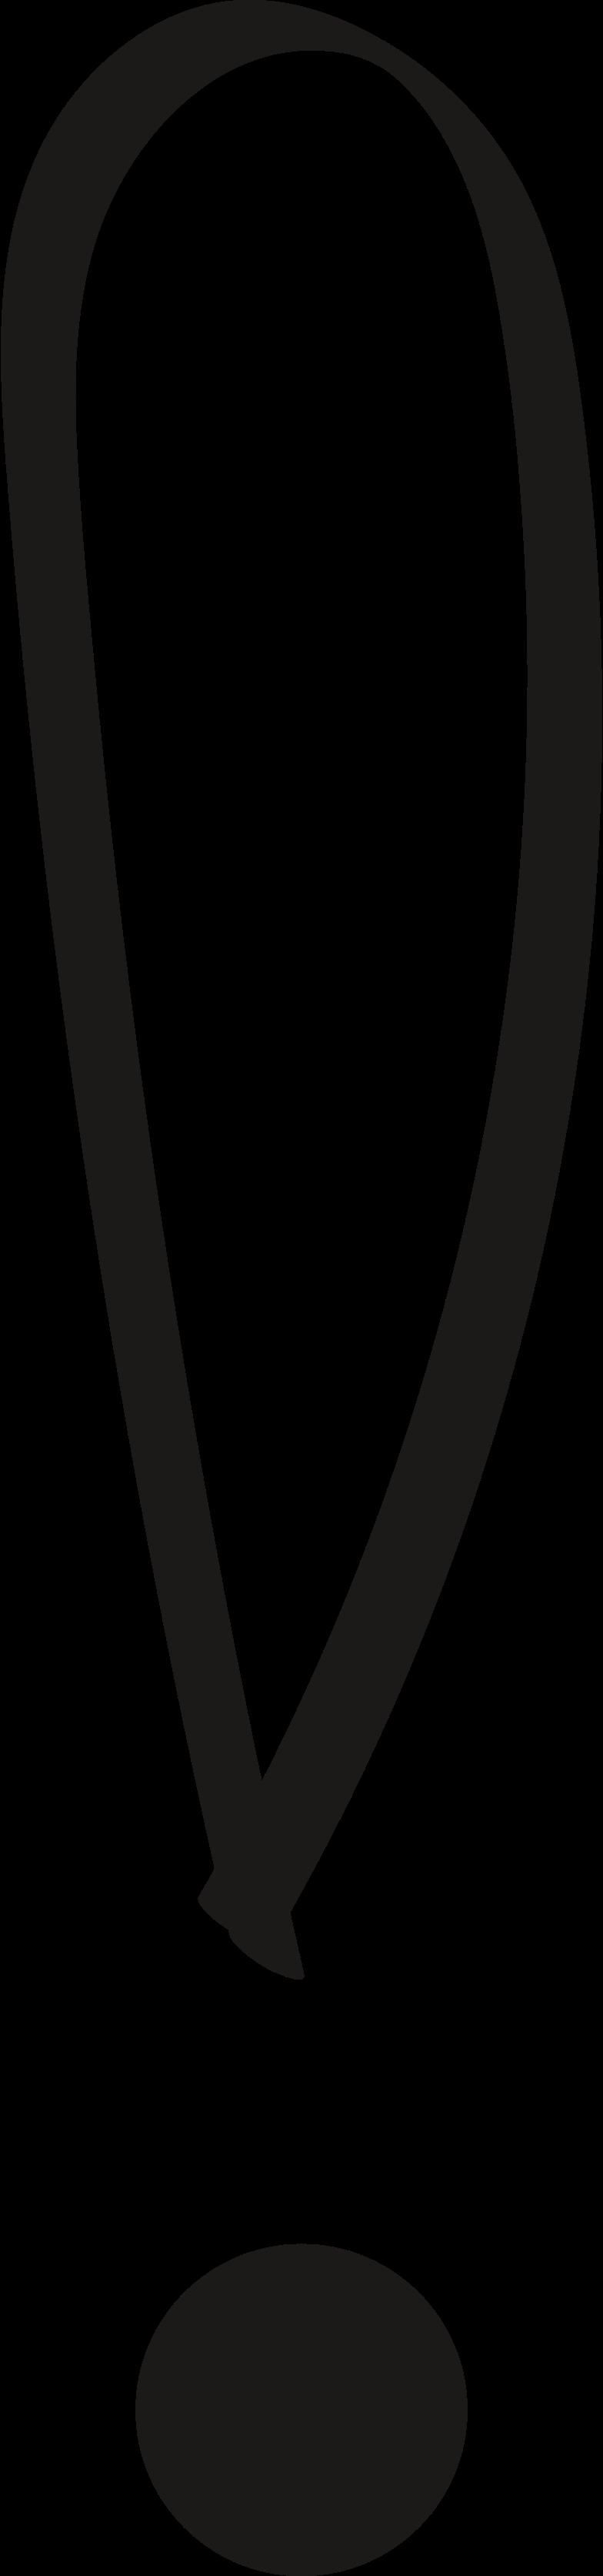 tk exclamation mark black Clipart illustration in PNG, SVG